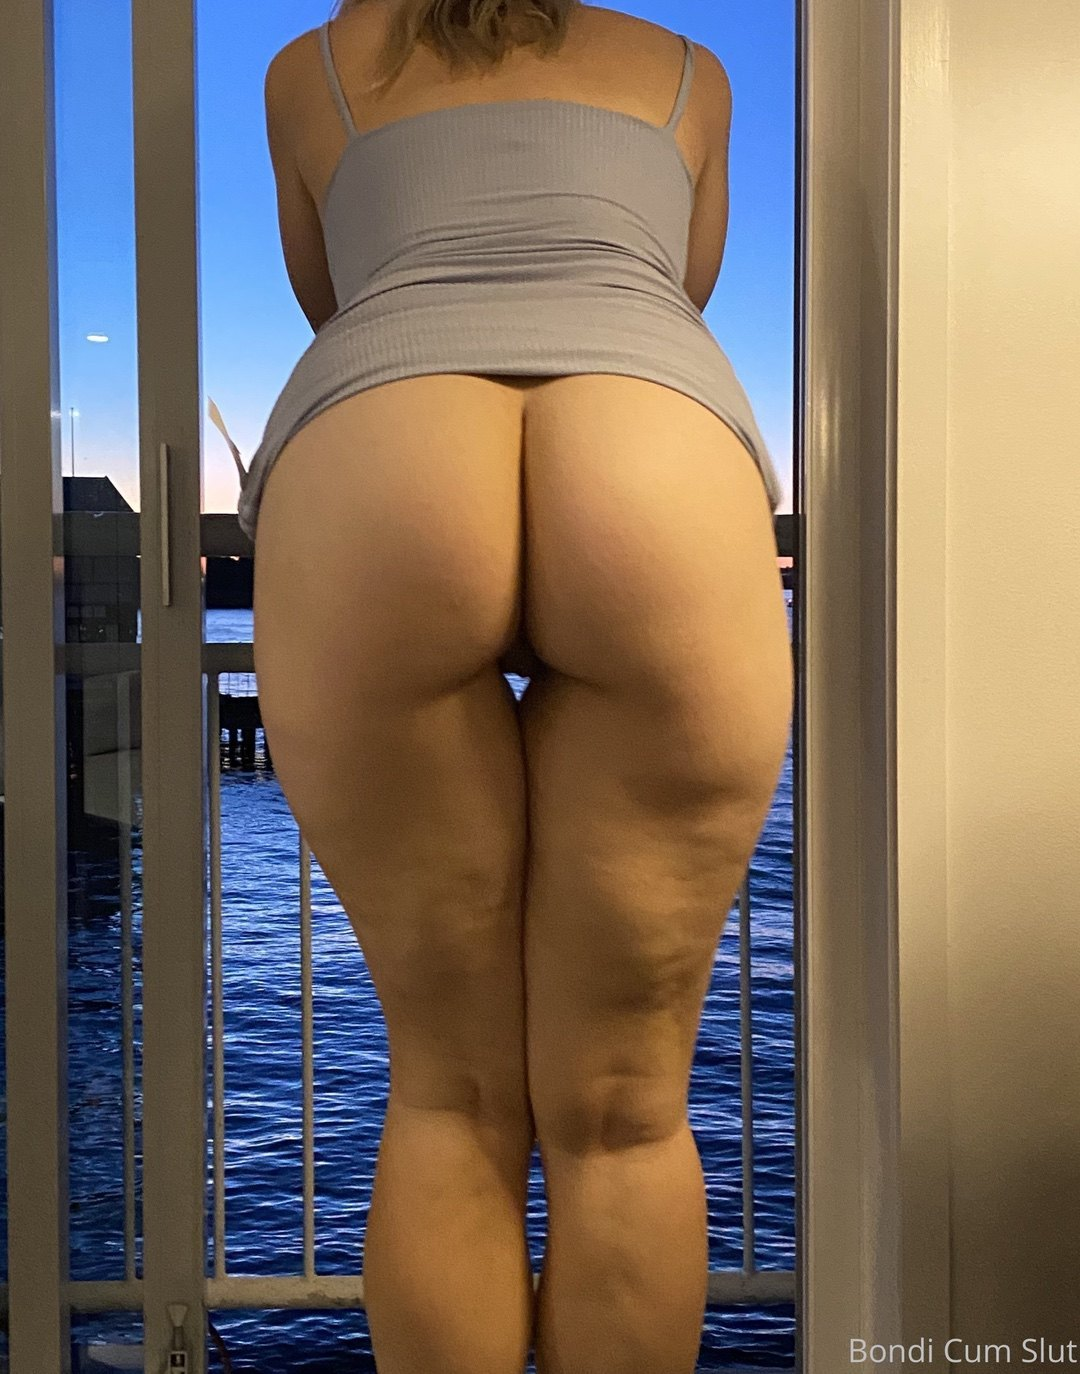 Bondi Cum Slut Bondicumslut Onlyfans Nudes Leaks 0006